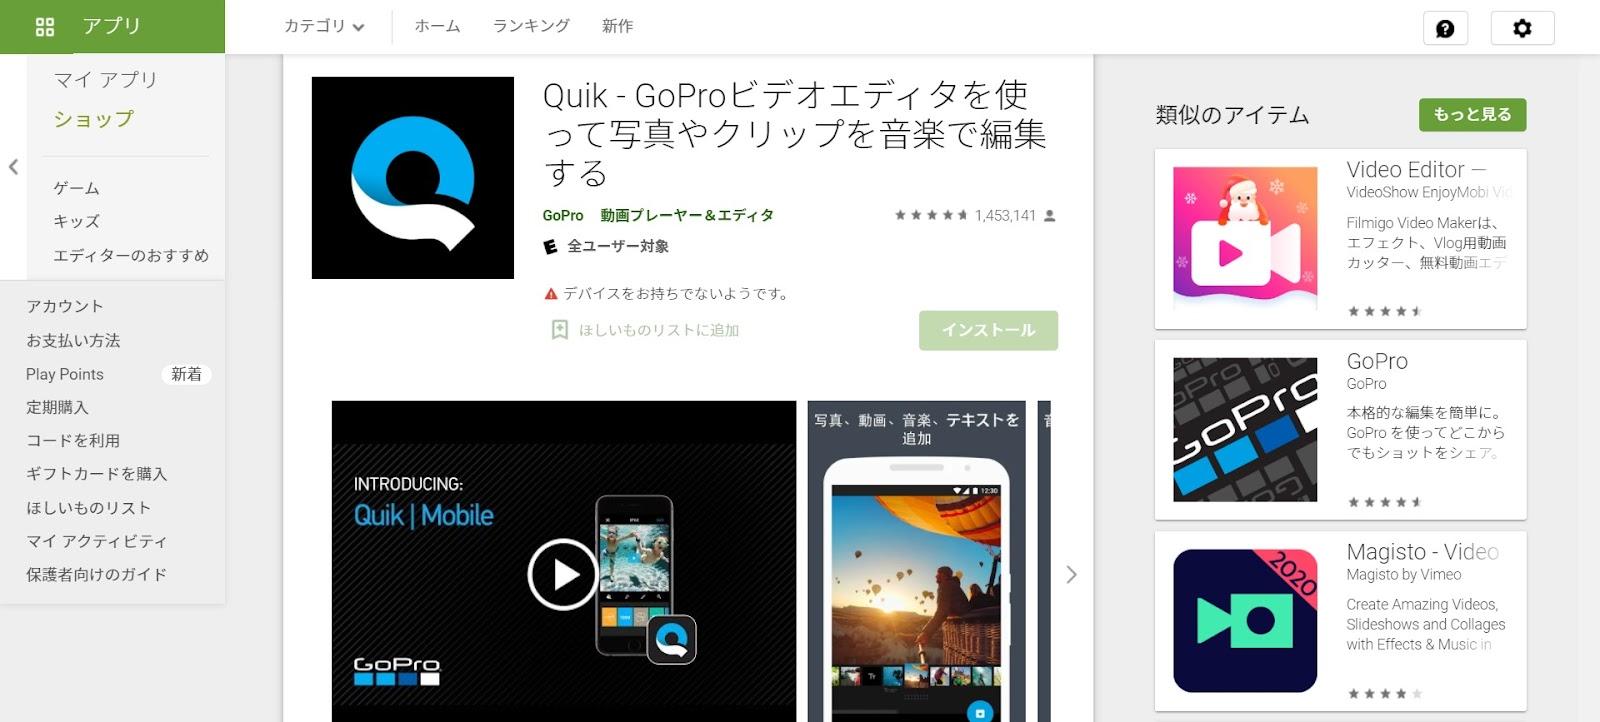 Google Play│Quik - GoProビデオエディタを使って写真やクリップを音楽で編集する